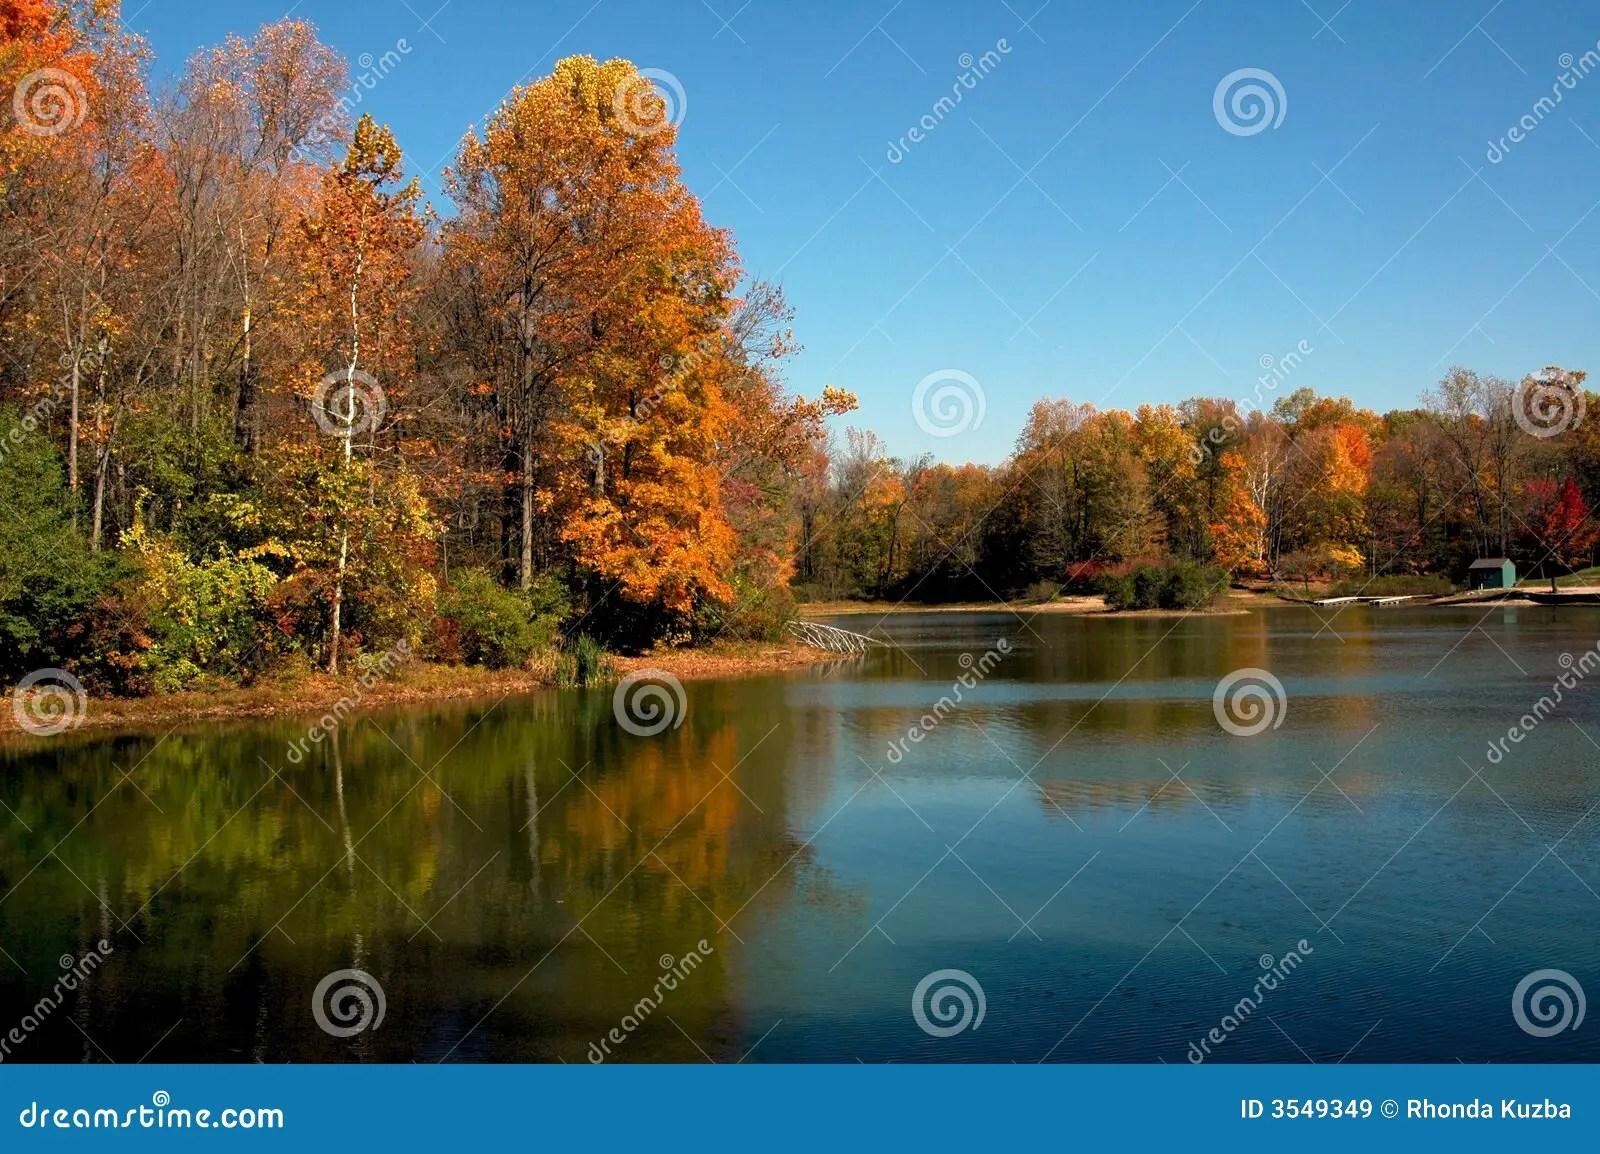 Fall Lake Scene Royalty Free Stock Images  Image 3549349